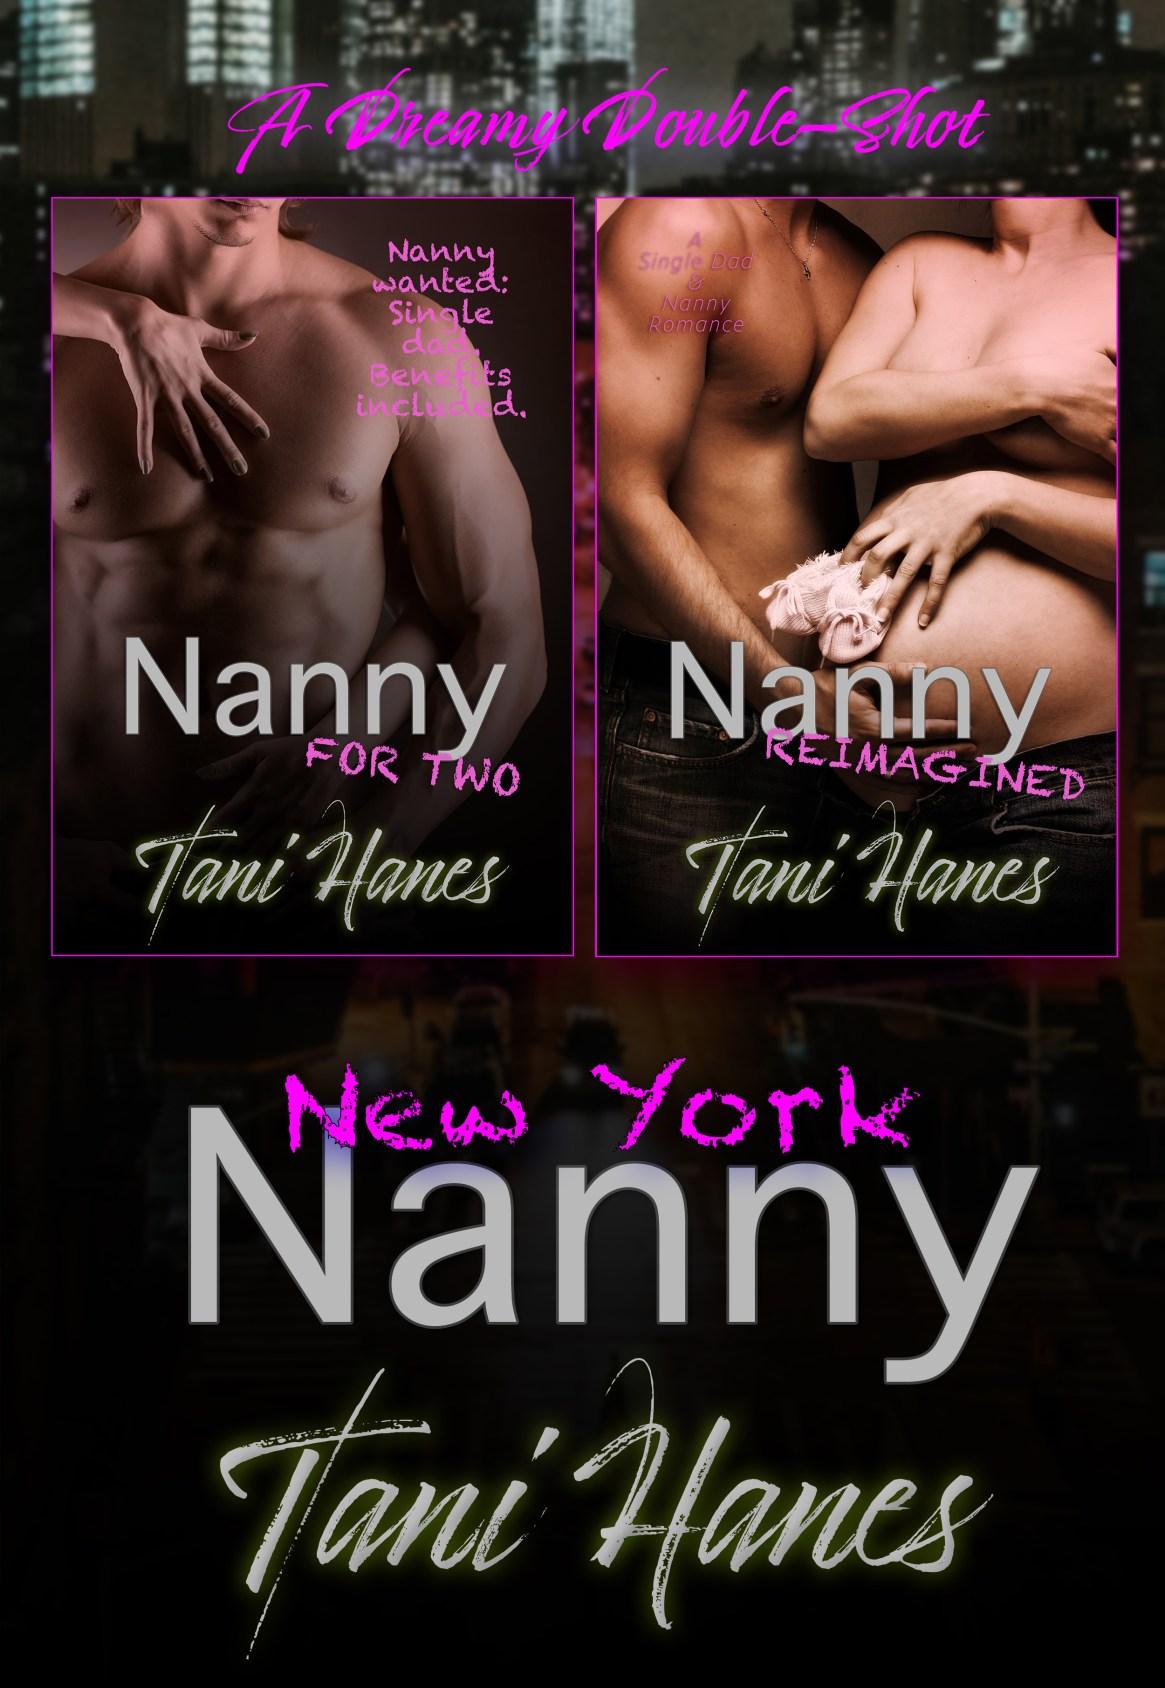 New York Nanny